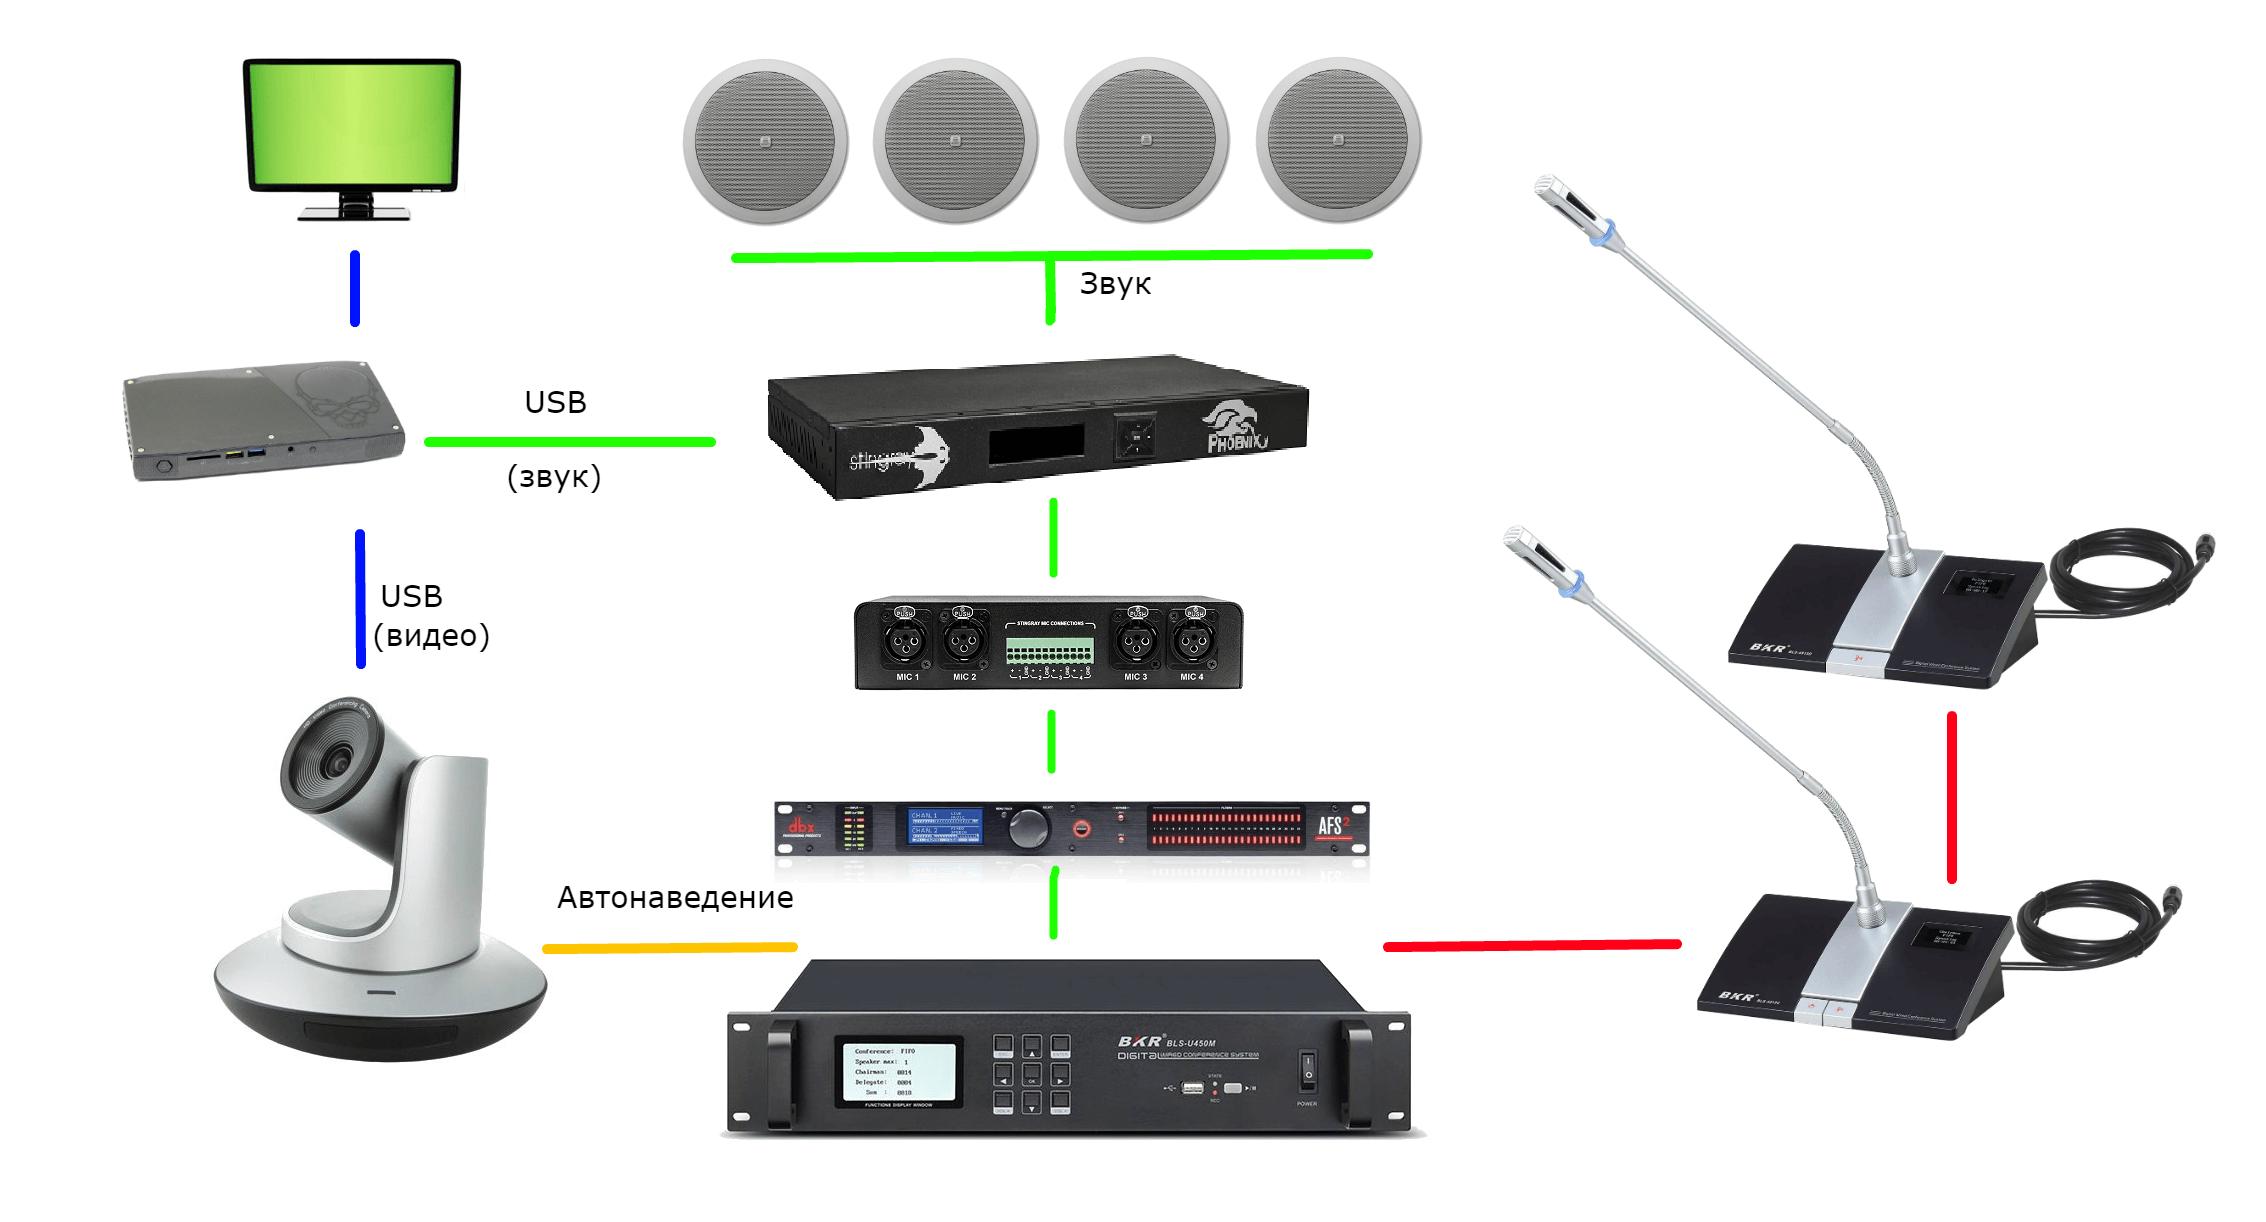 Комплект UnitKit Autotracking wired PRO _1